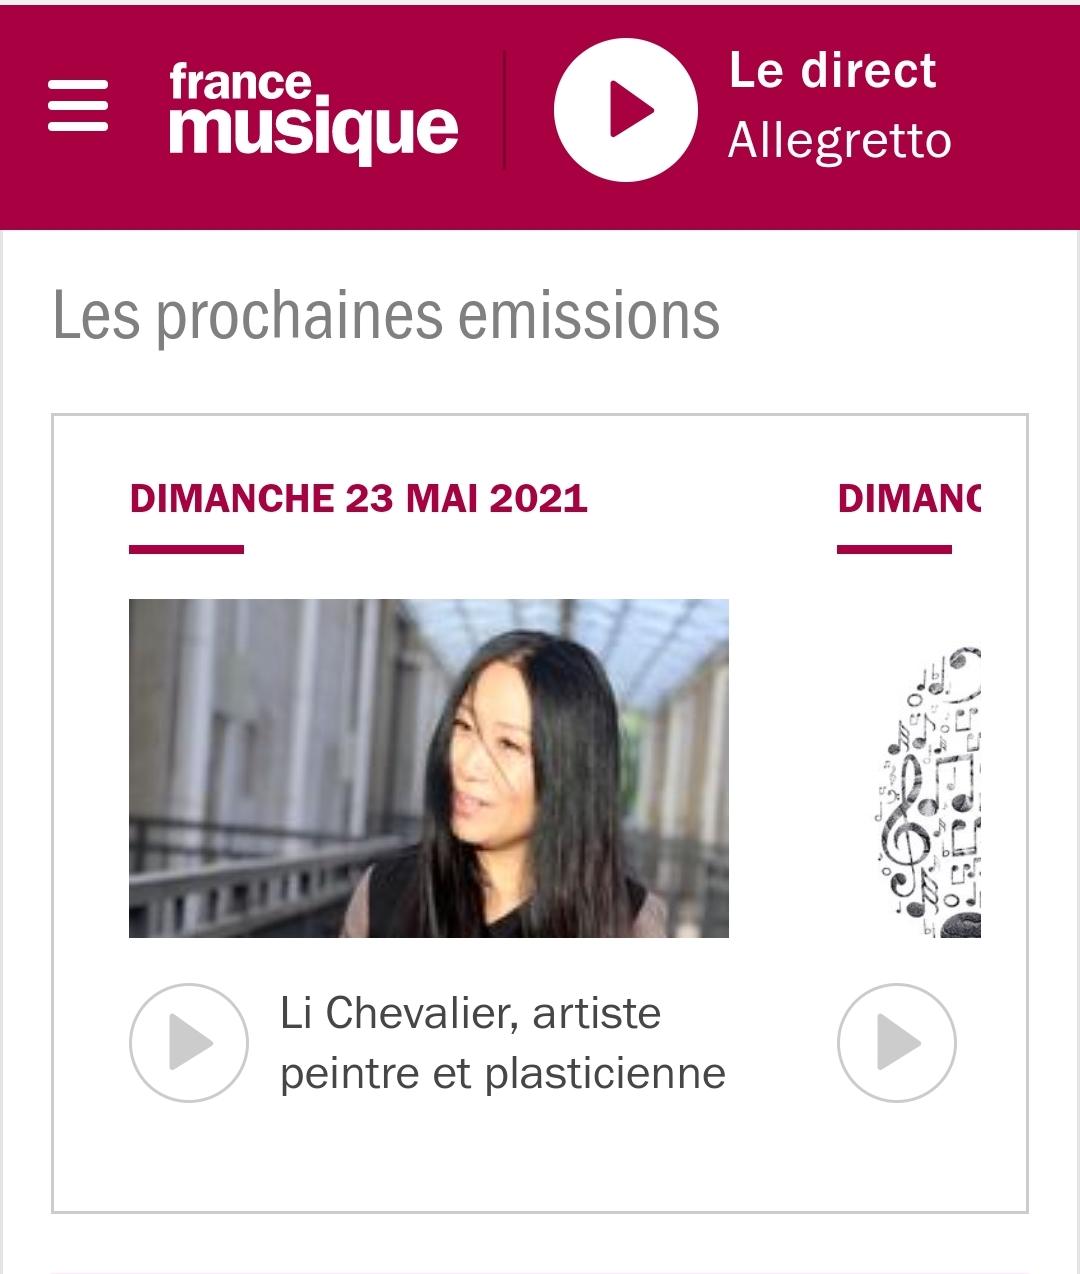 France musique introduction li chevalier avril 2021.odt.jpg